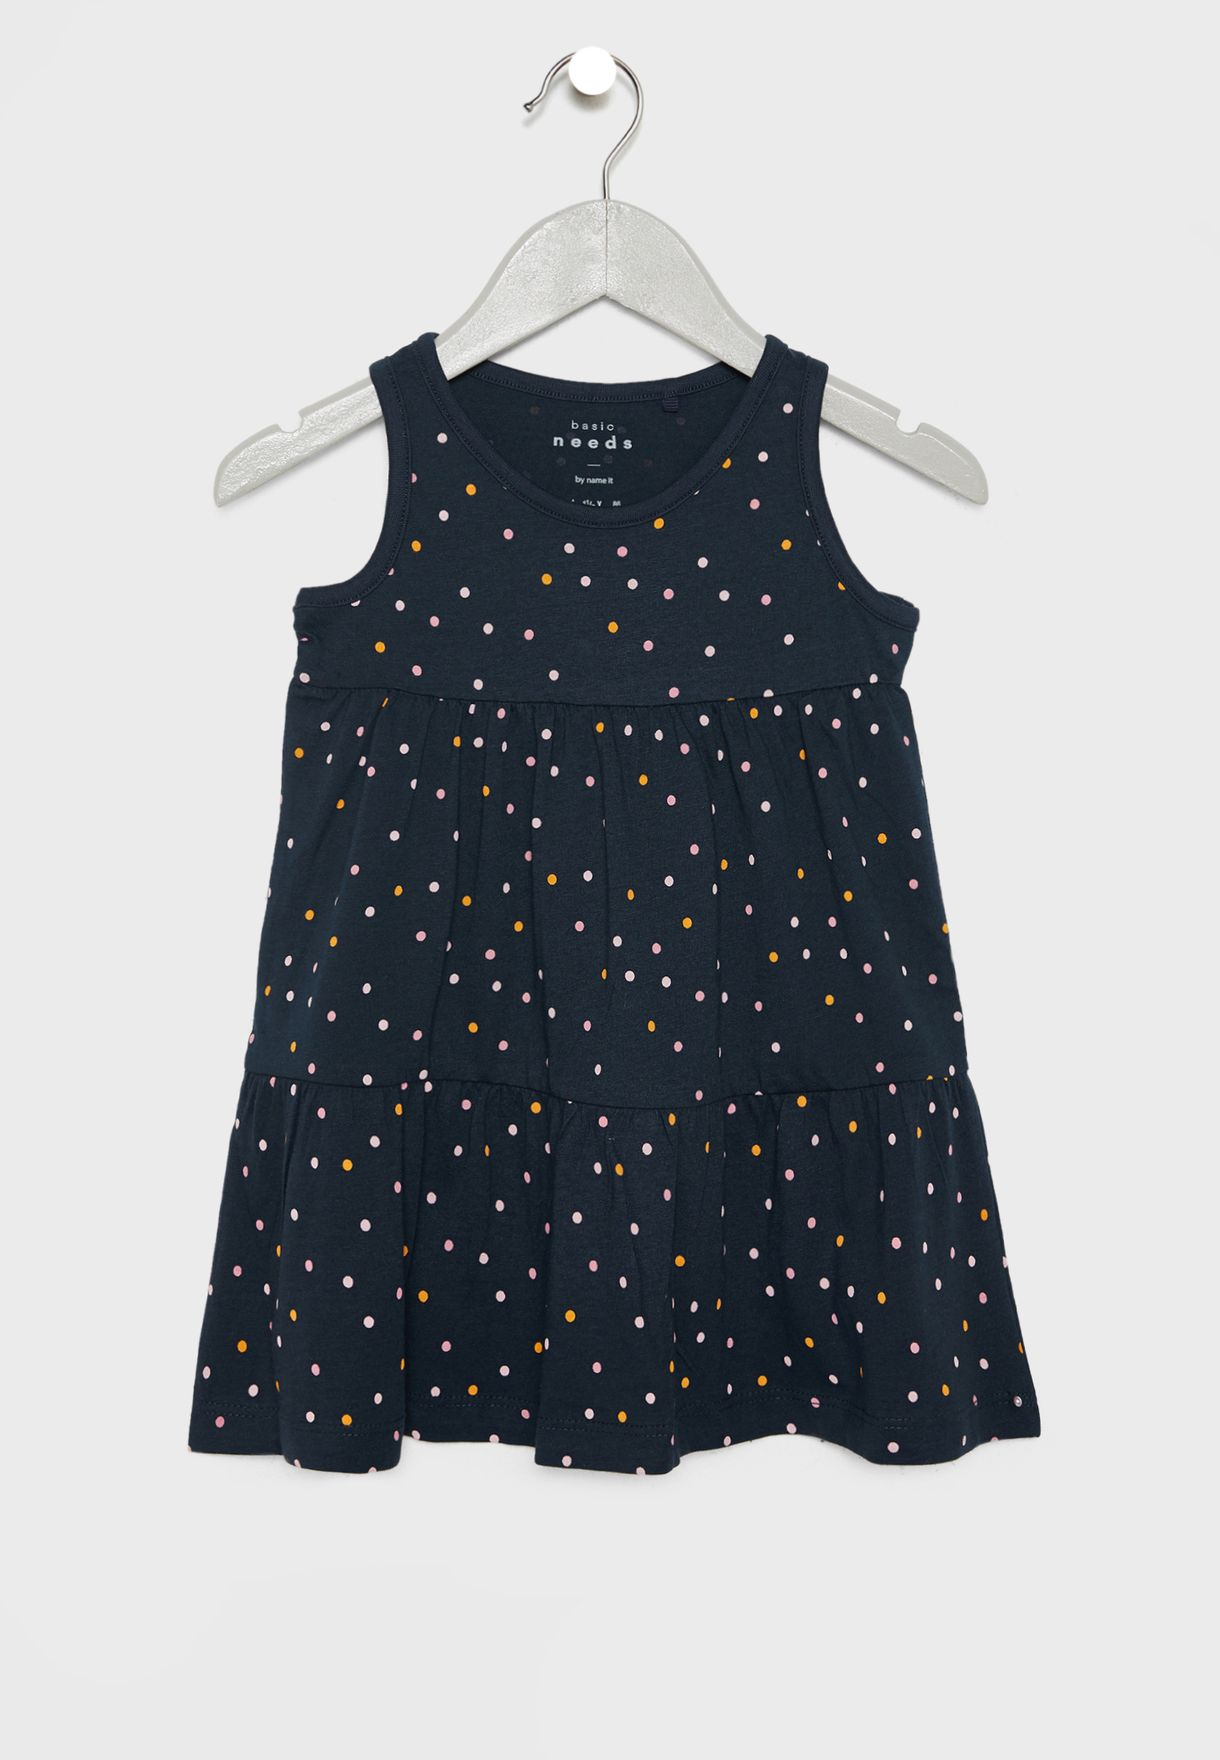 Kids Dotted Dress